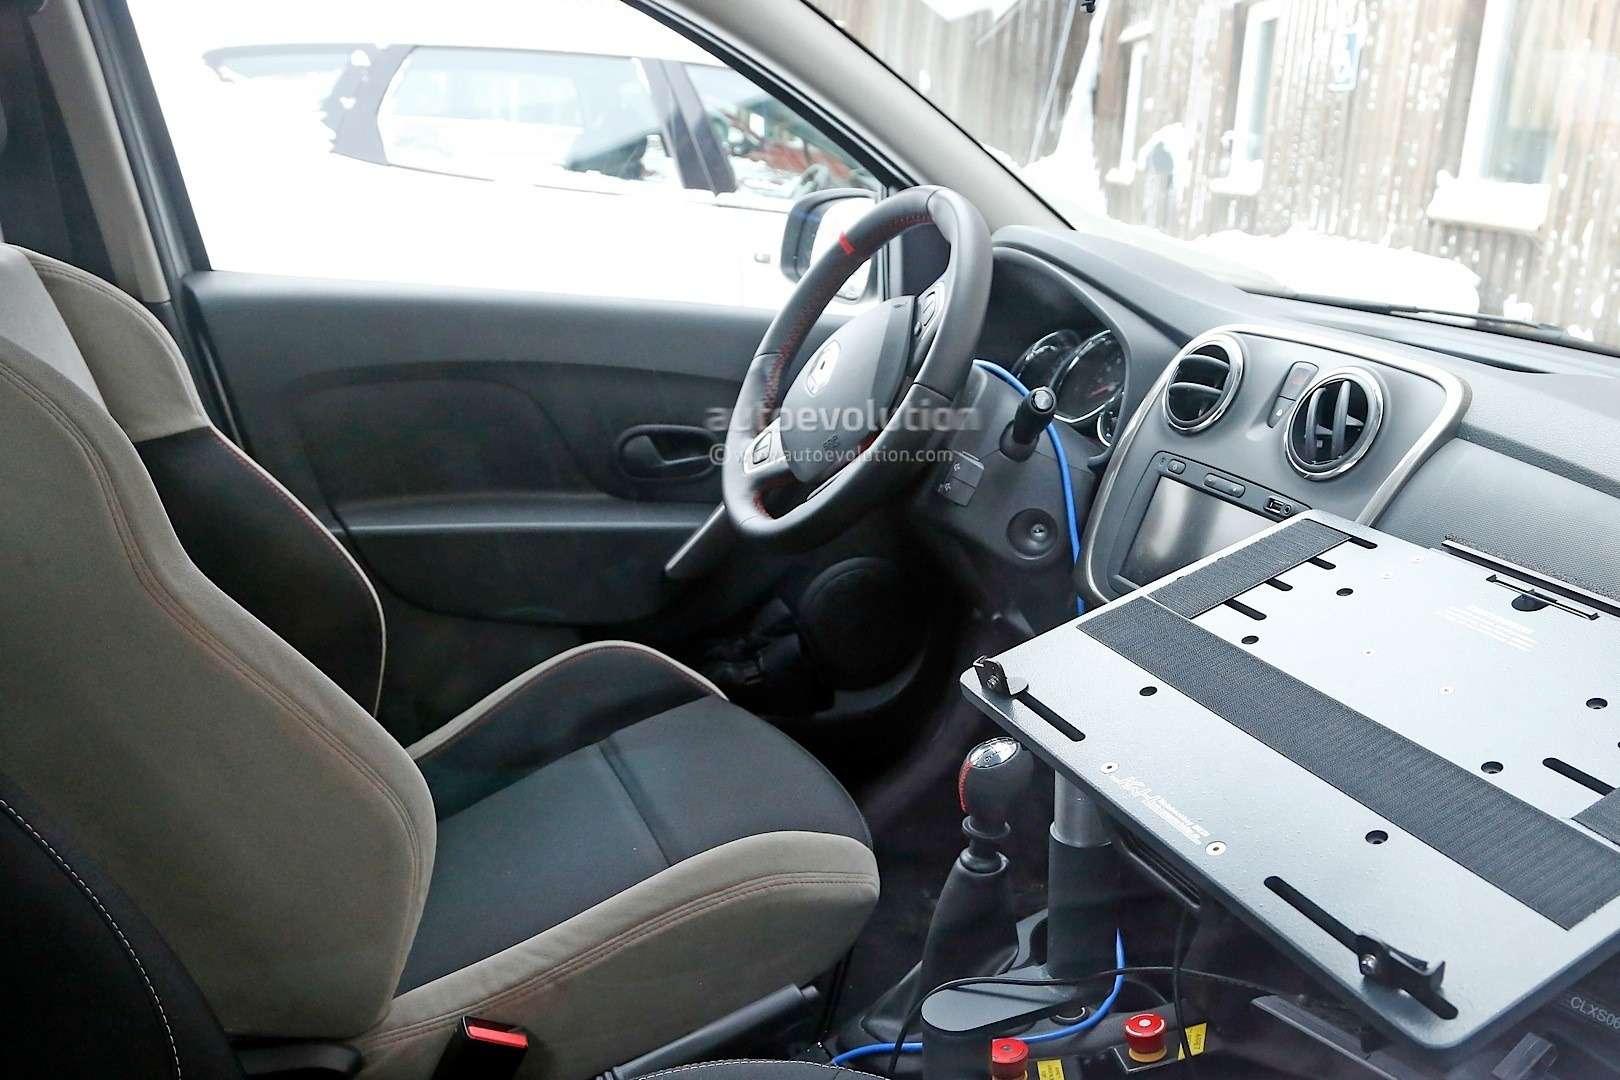 spyshots-dacia-sandero-rs-getting-12-turbo-engine-sportier-interior_8